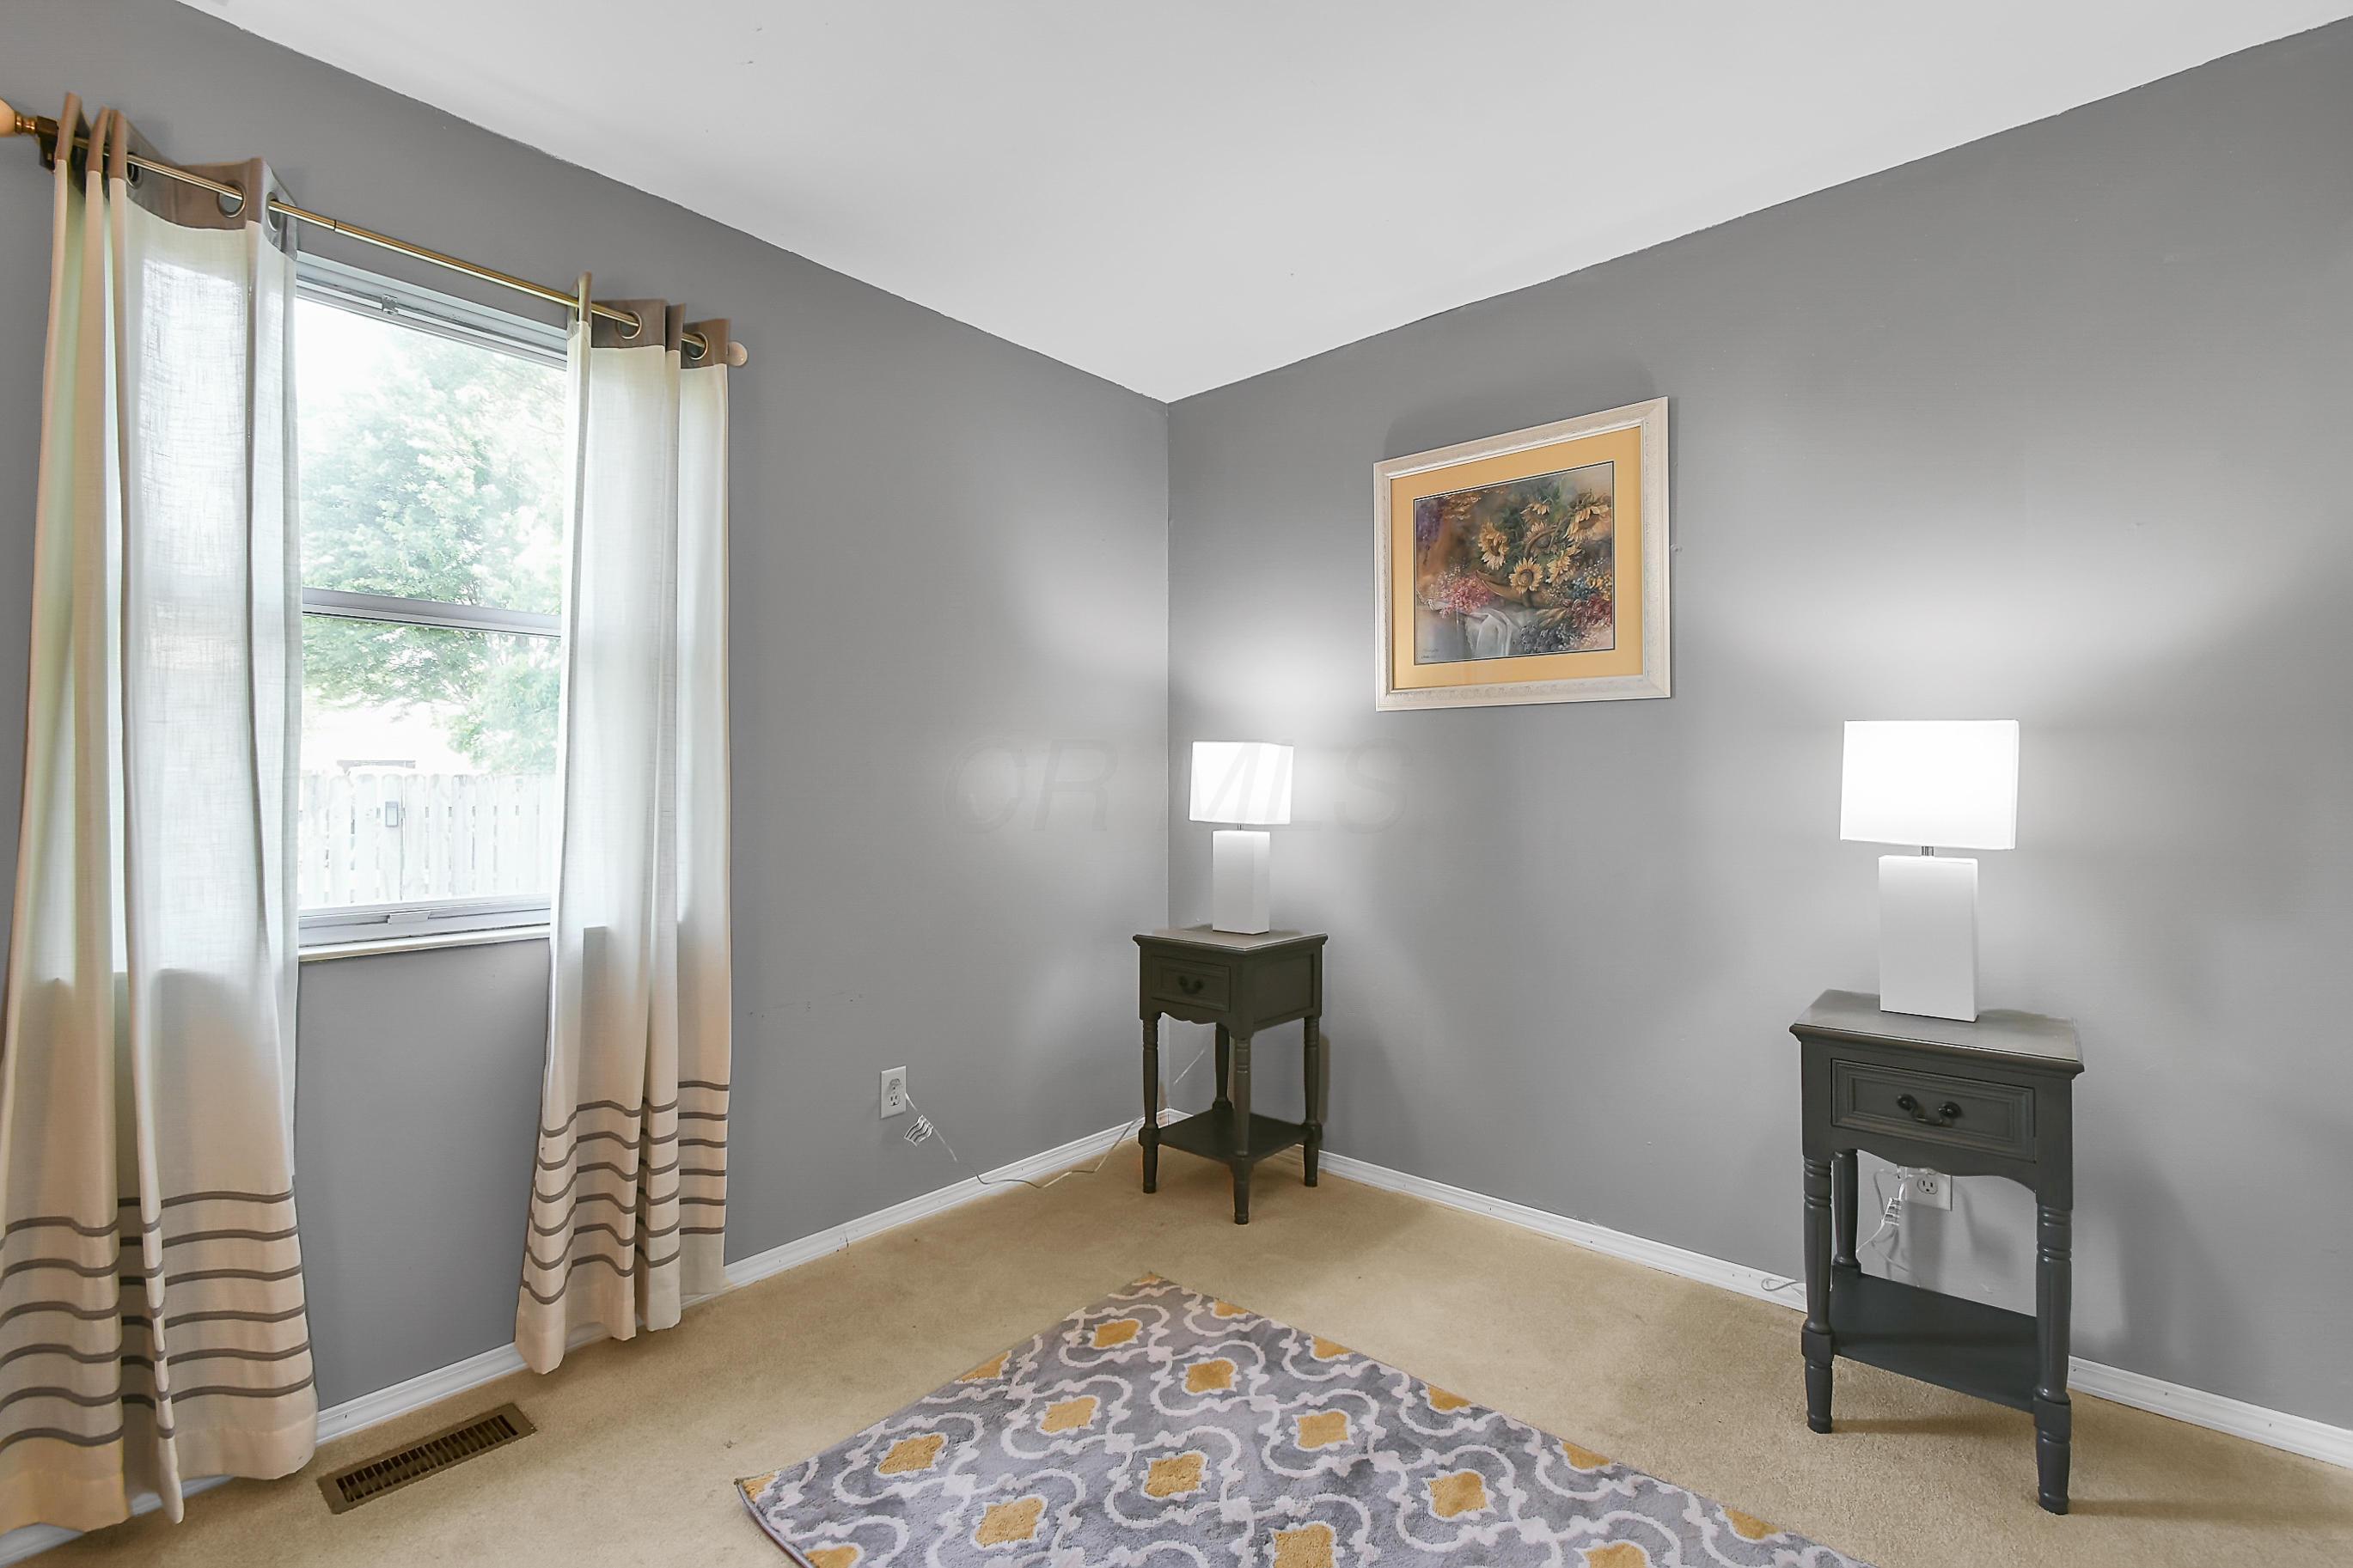 844 Norahrow Drive, Worthington, Ohio 43085, 2 Bedrooms Bedrooms, ,1 BathroomBathrooms,Residential,For Sale,Norahrow,220019796